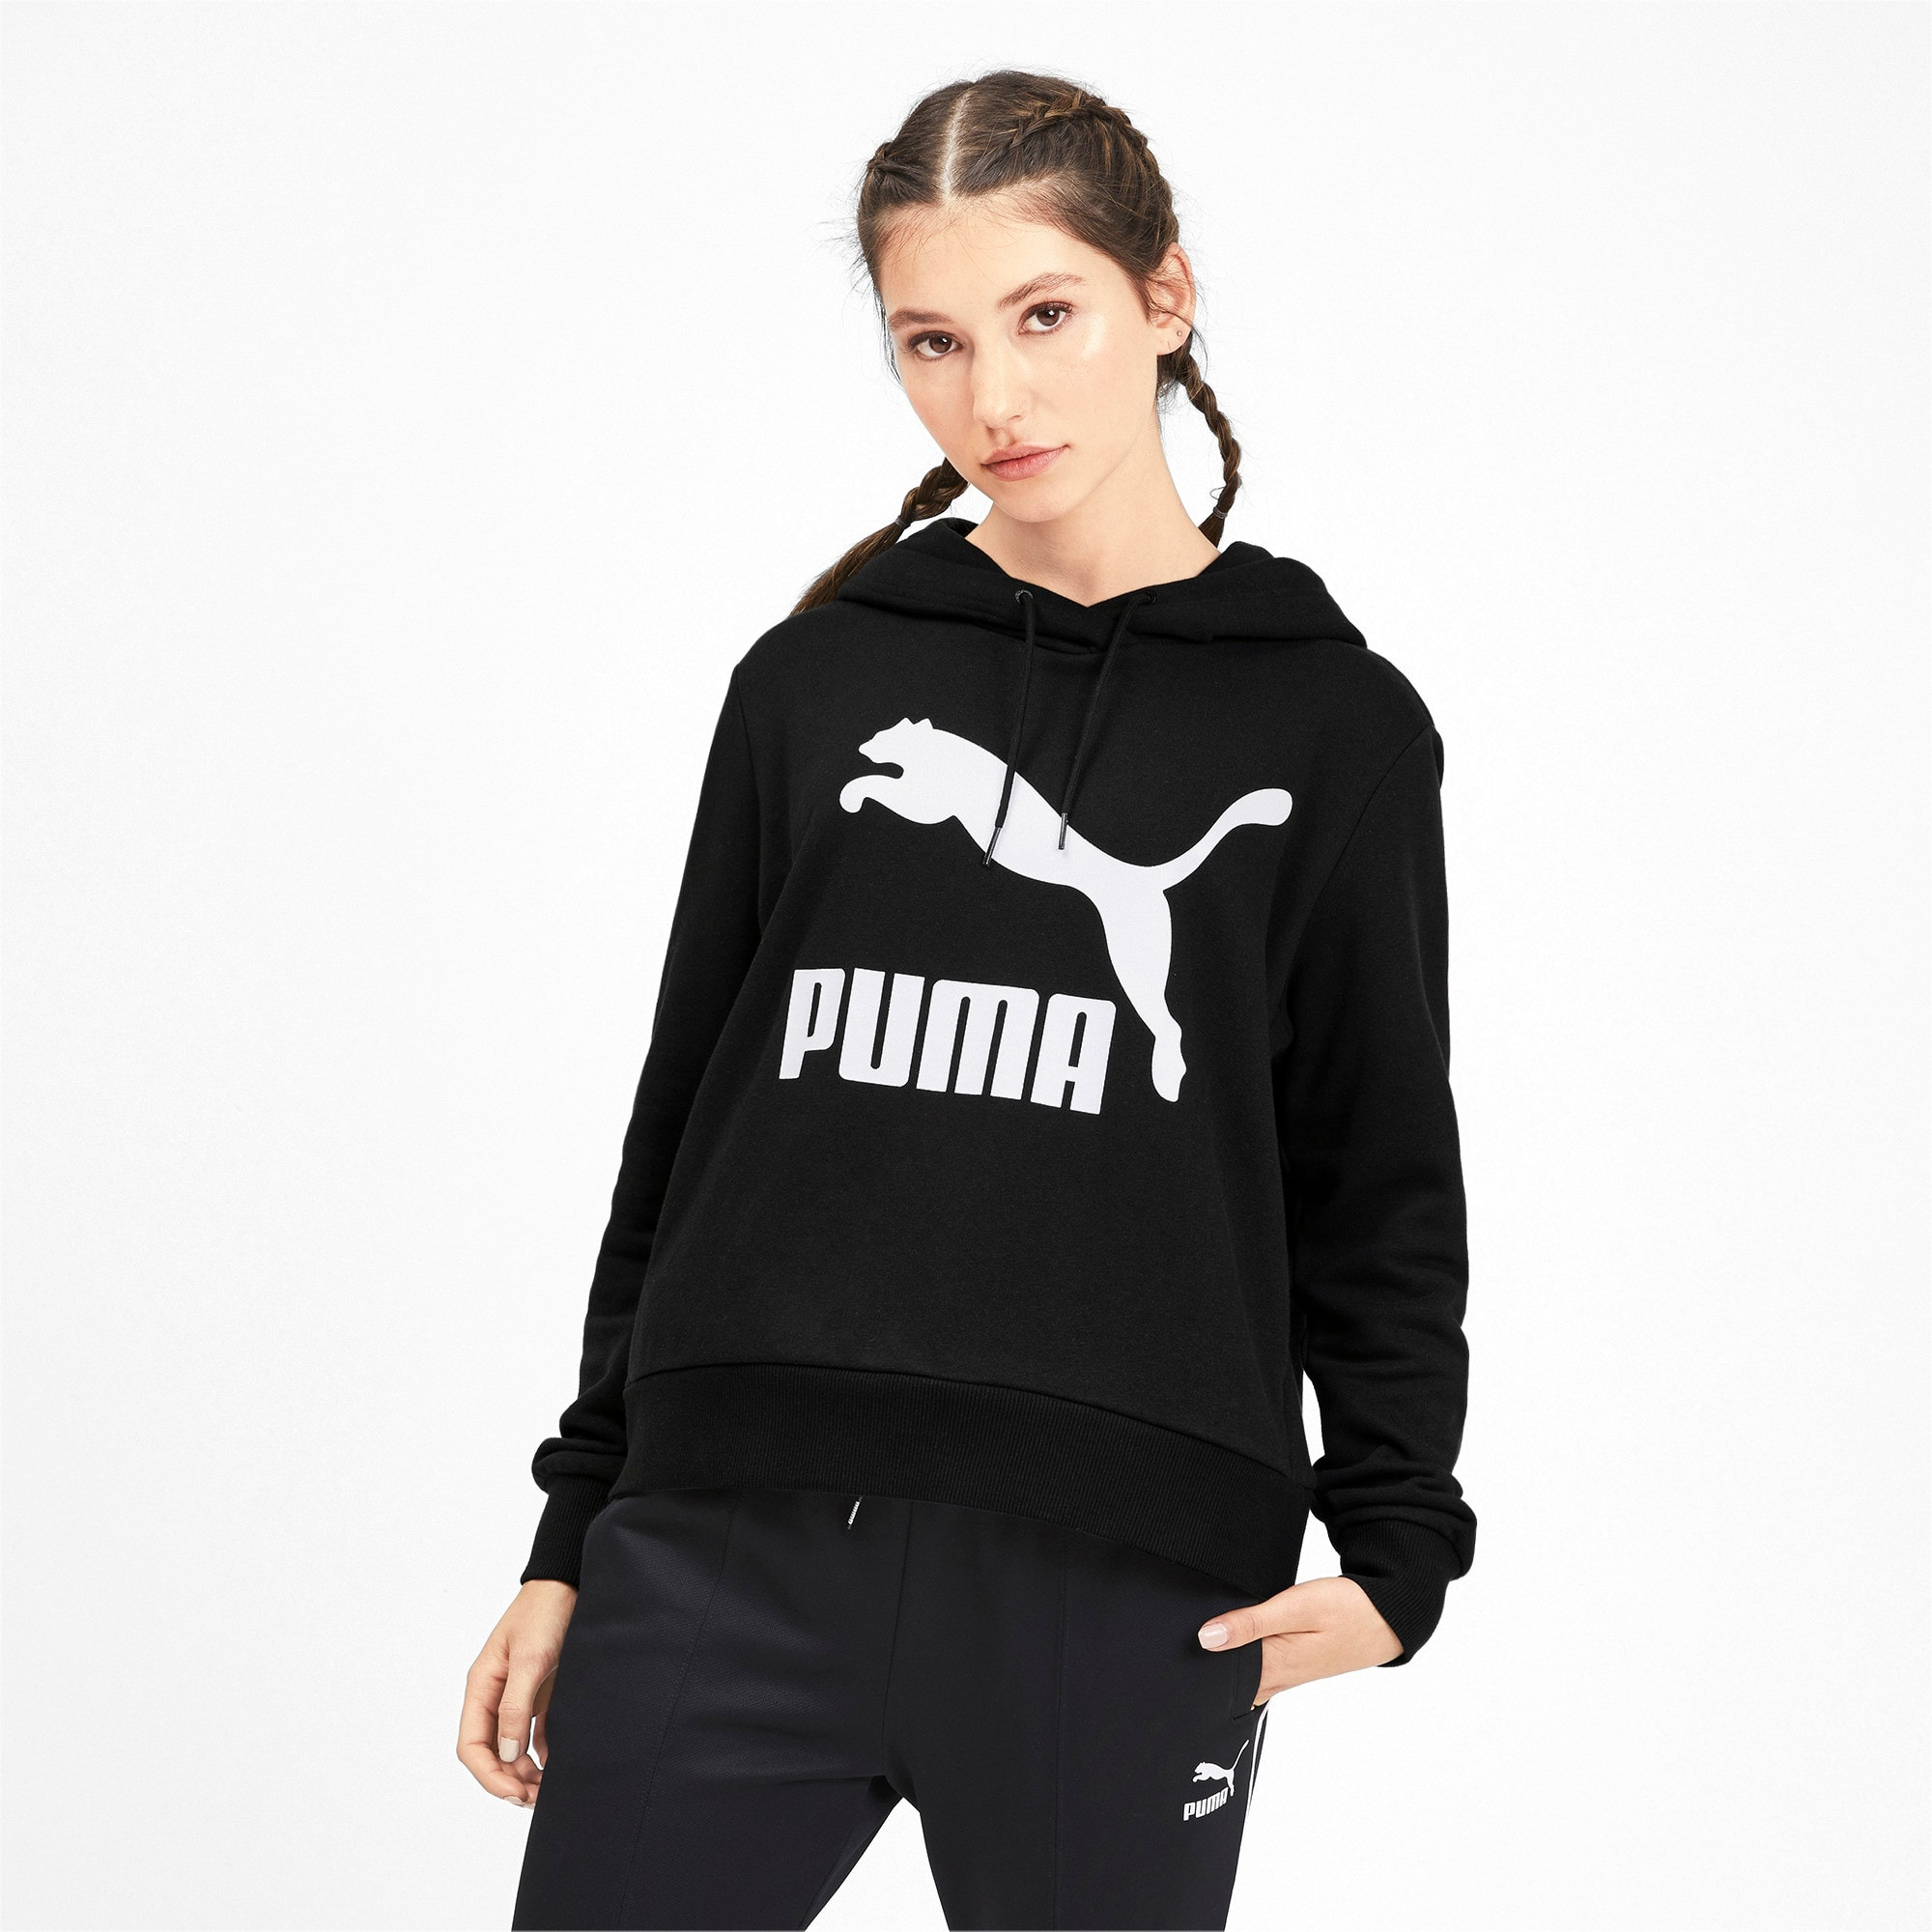 Thumbnail 2 of Classics Logo Women's Hoodie, Puma Black, medium